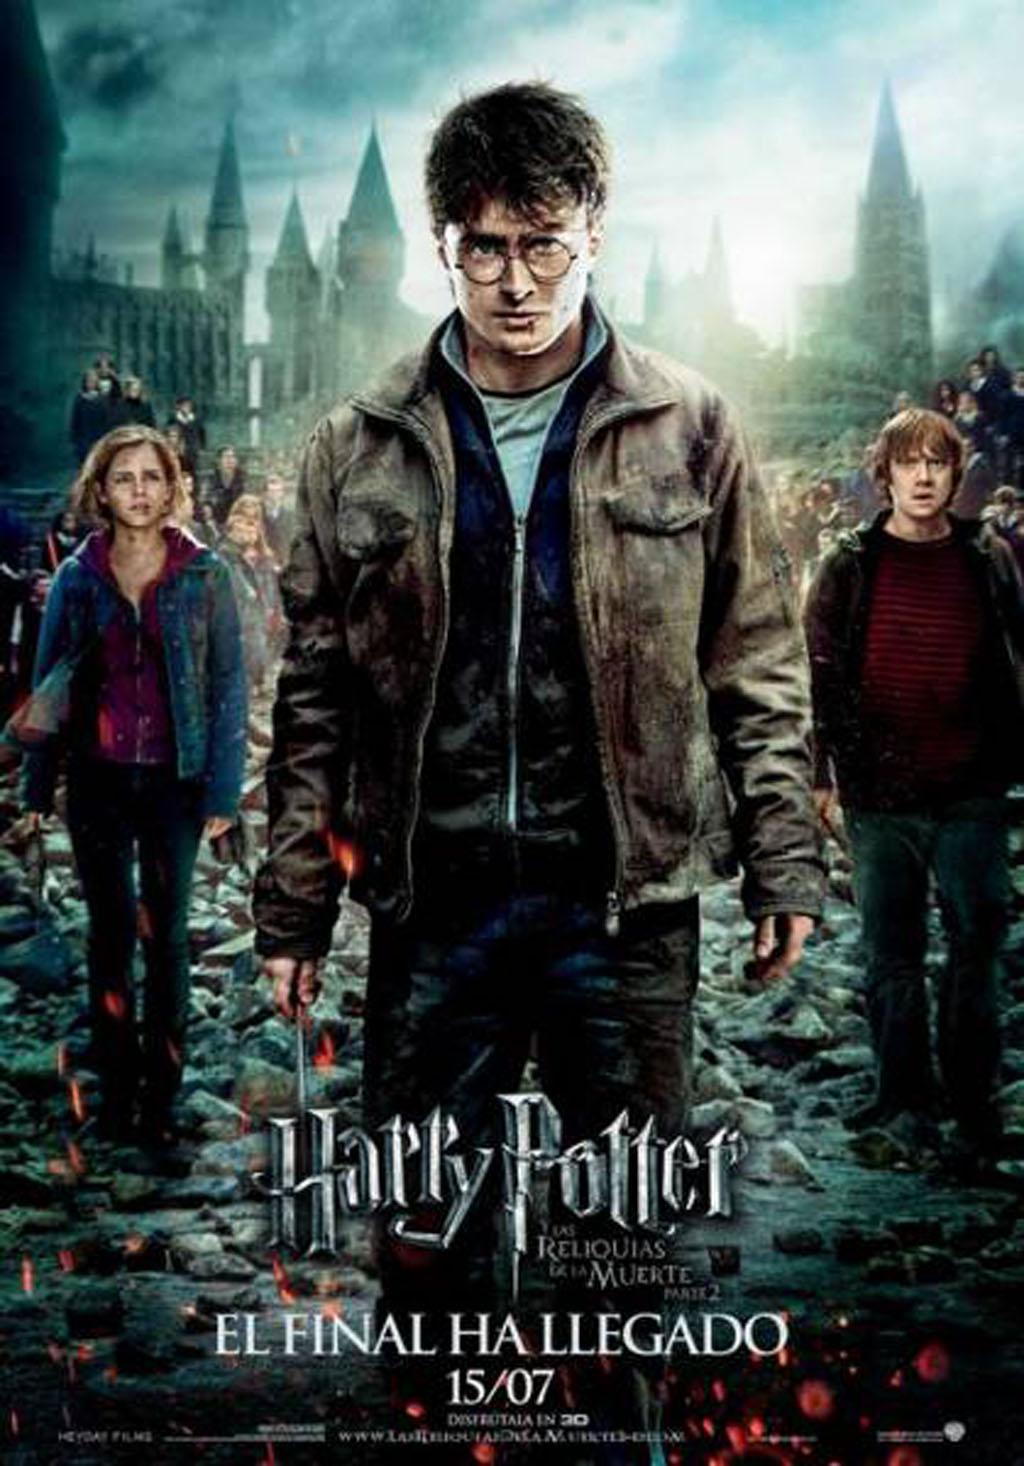 http://3.bp.blogspot.com/-FFDEgwdg_SM/Tivt_aZARVI/AAAAAAAAAmI/labejZnzxKc/s1600/Harry_Potter_Y_Las_Reliquias_De_La_Muerte_Parte_2-Cartel.jpg